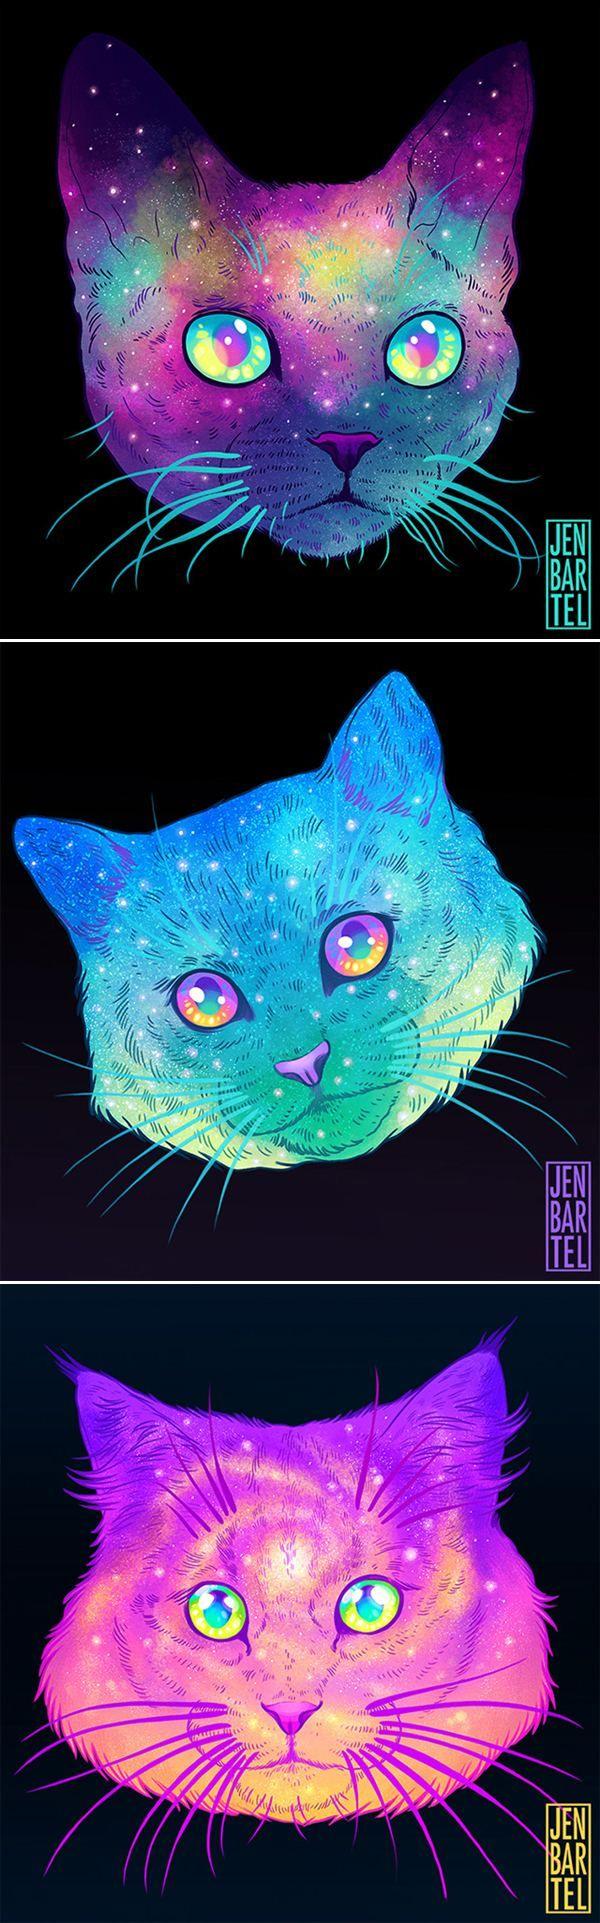 Illustrator Jen Bartel's Awesome Galactic Cats #art #illustrations #cats